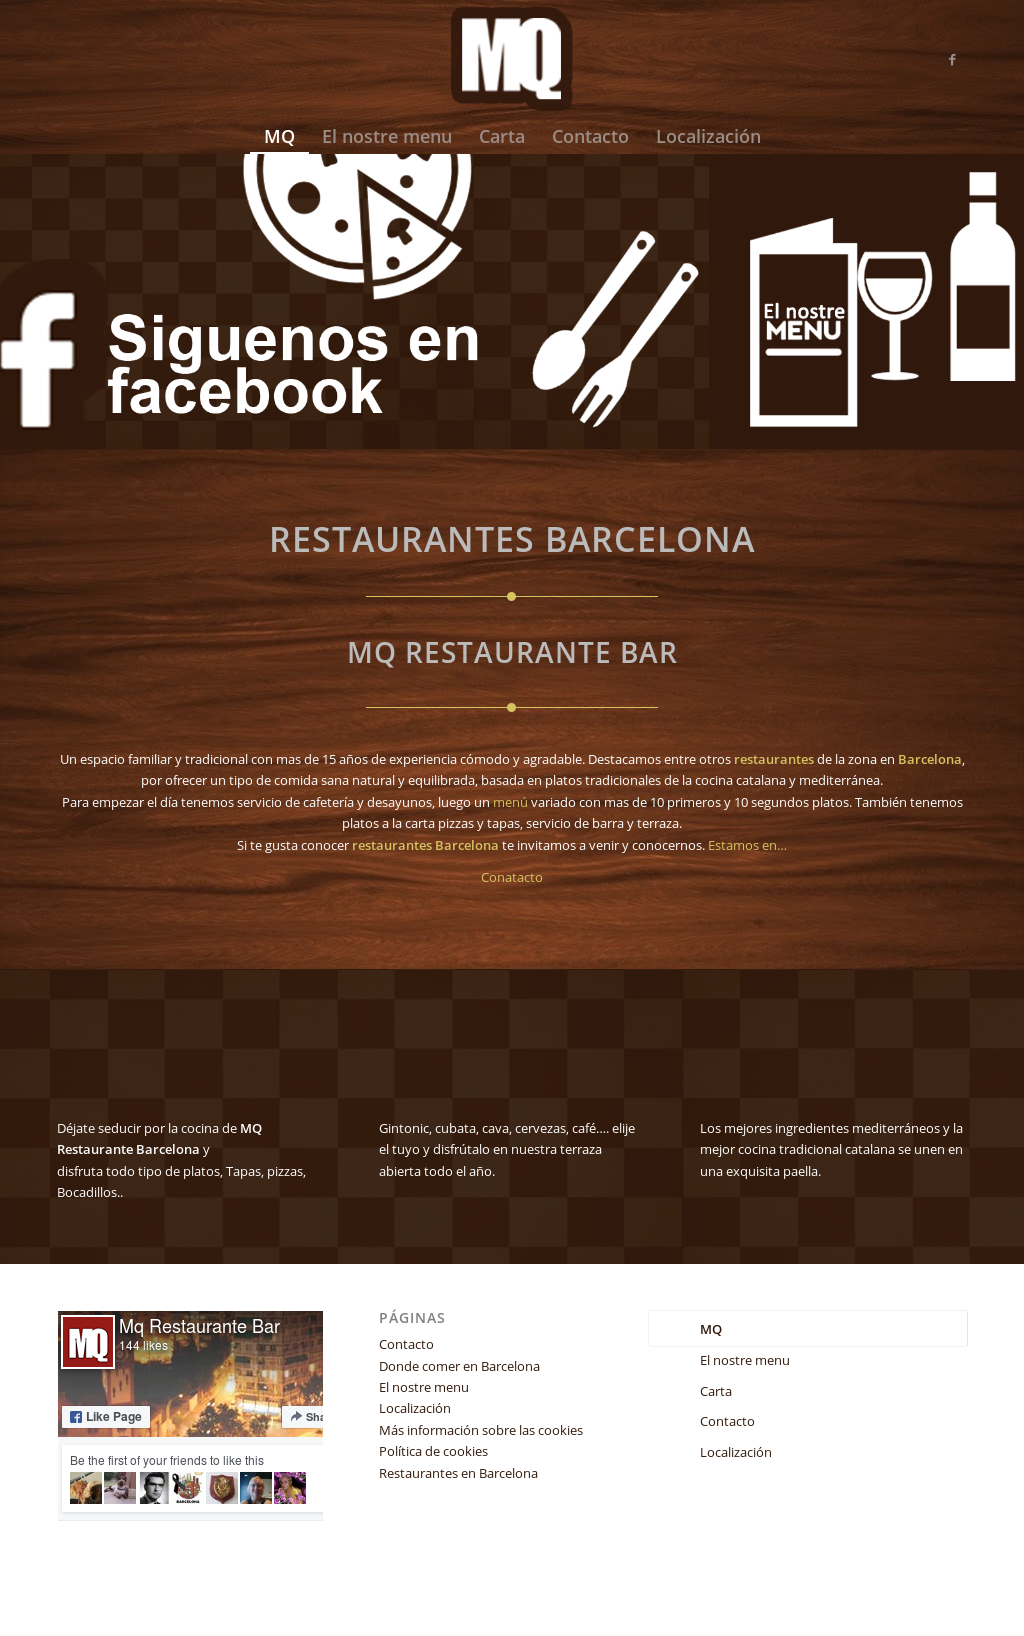 Mq Restaurante Bar Competitors Revenue And Employees